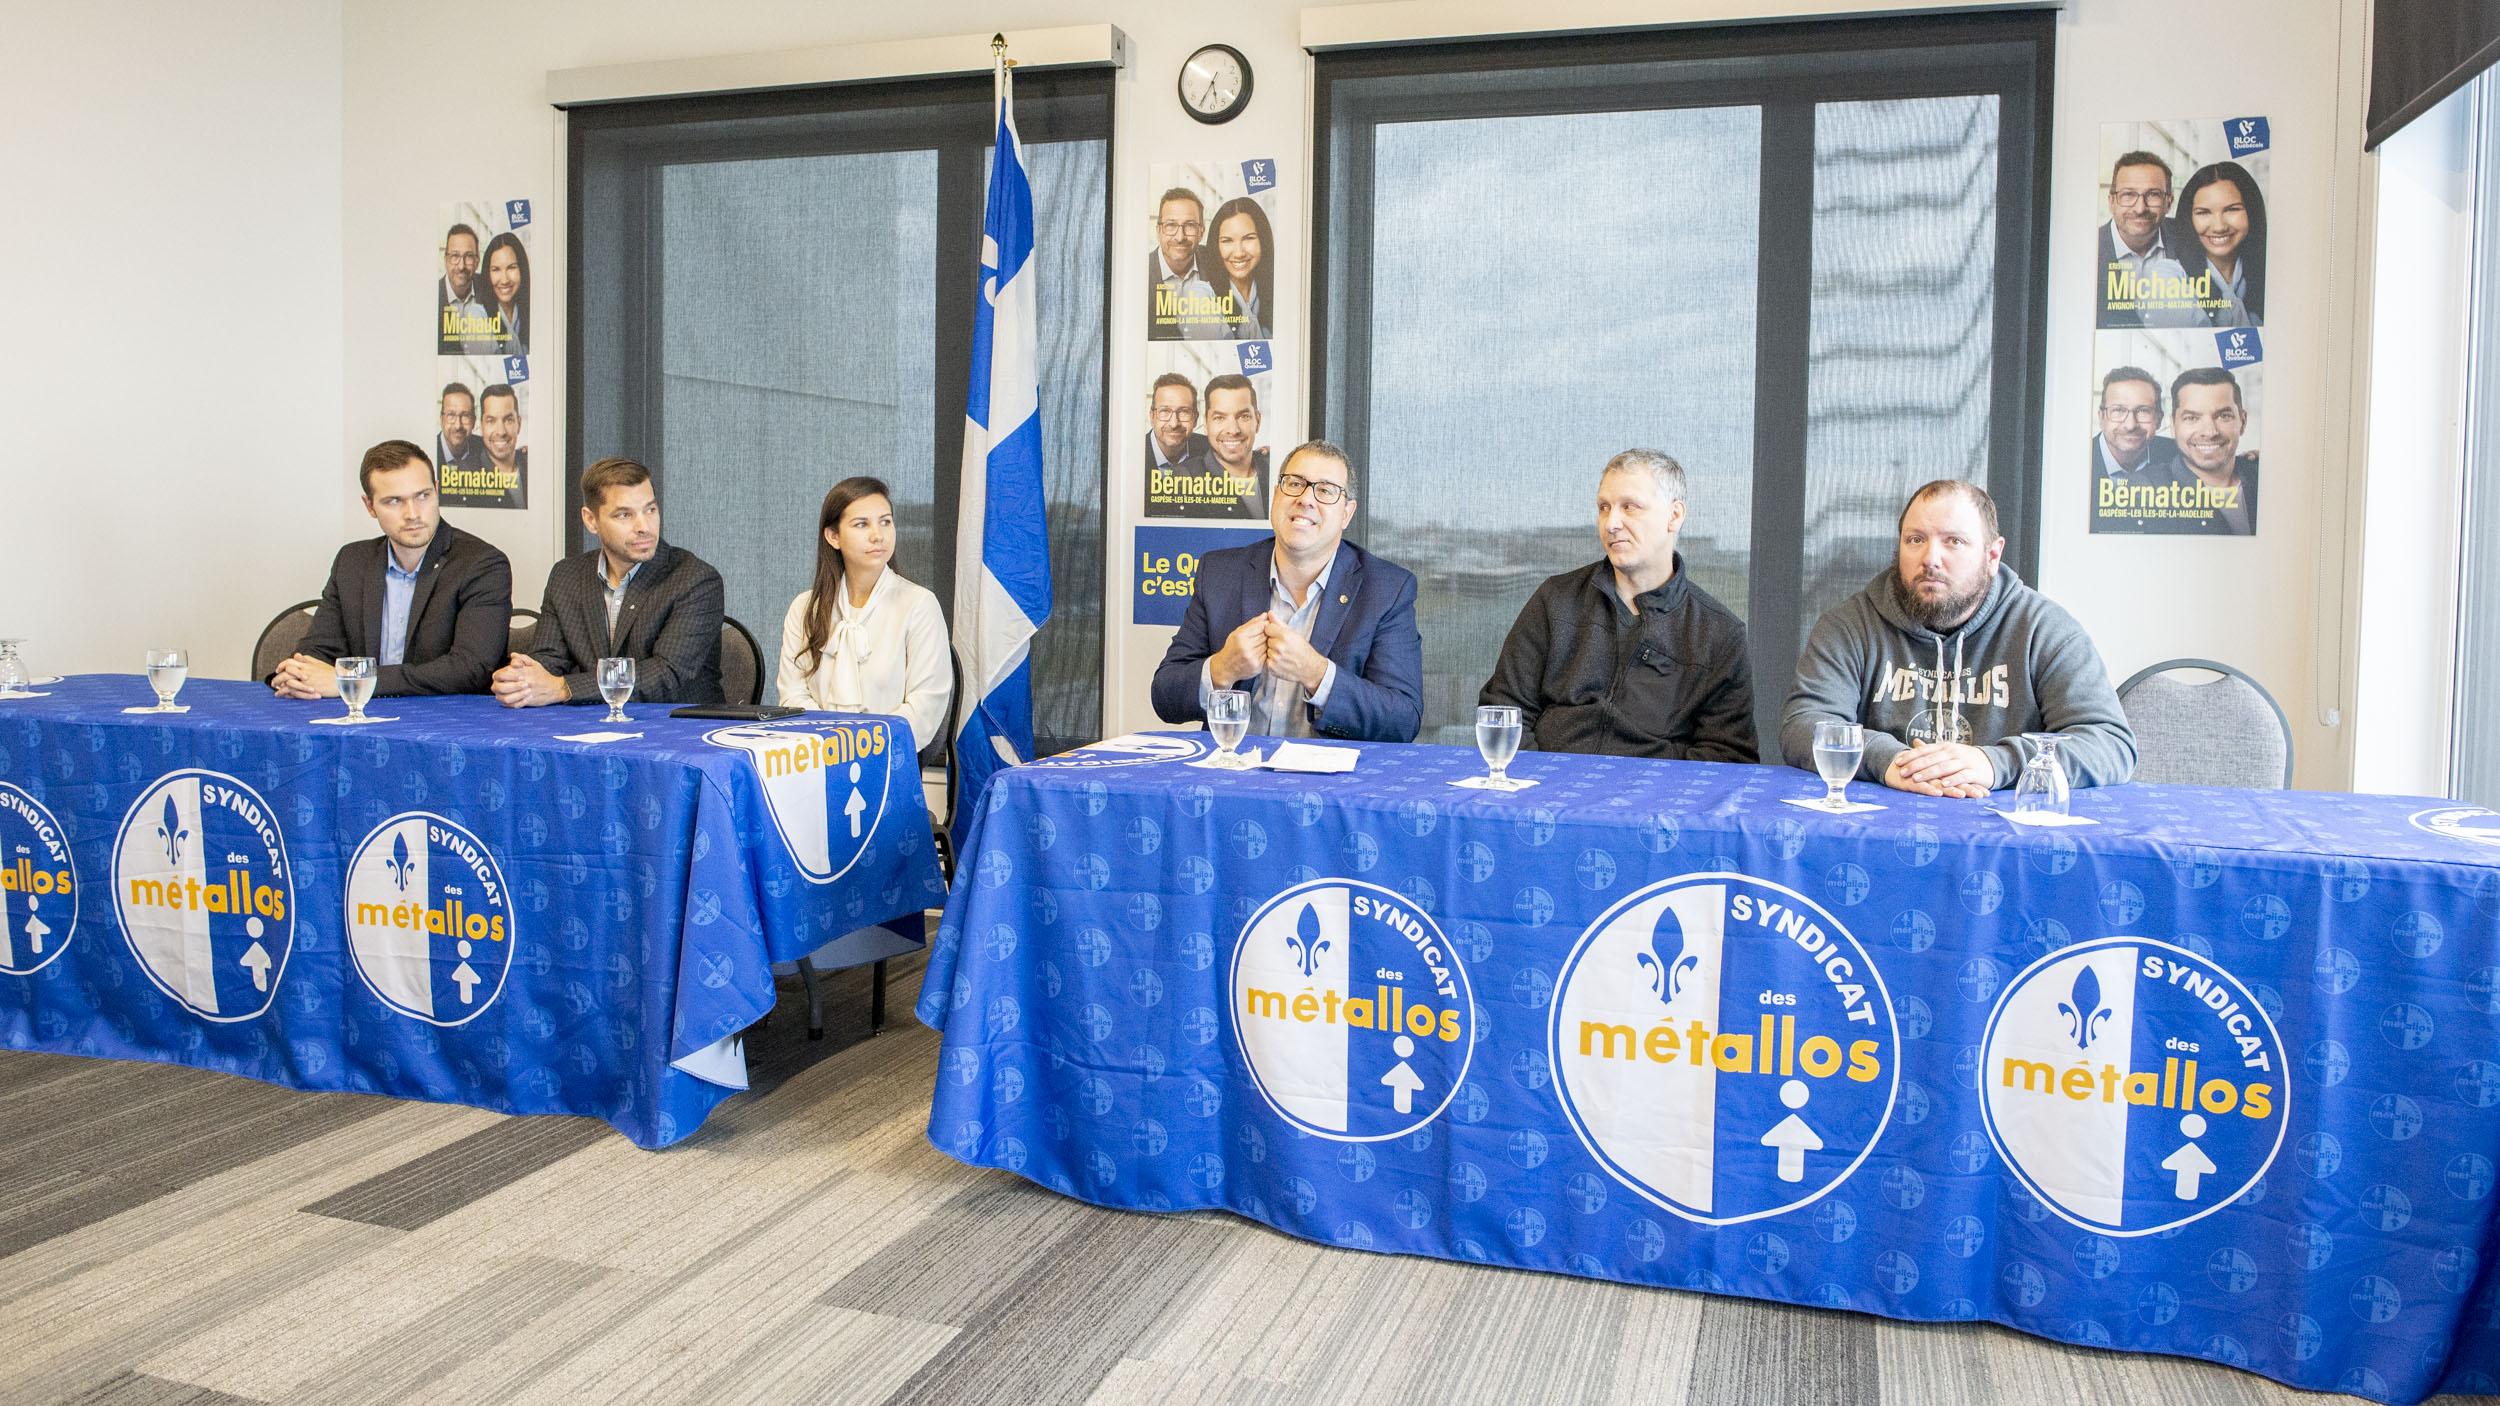 Soutien syndicat métallos Est-du-Québec